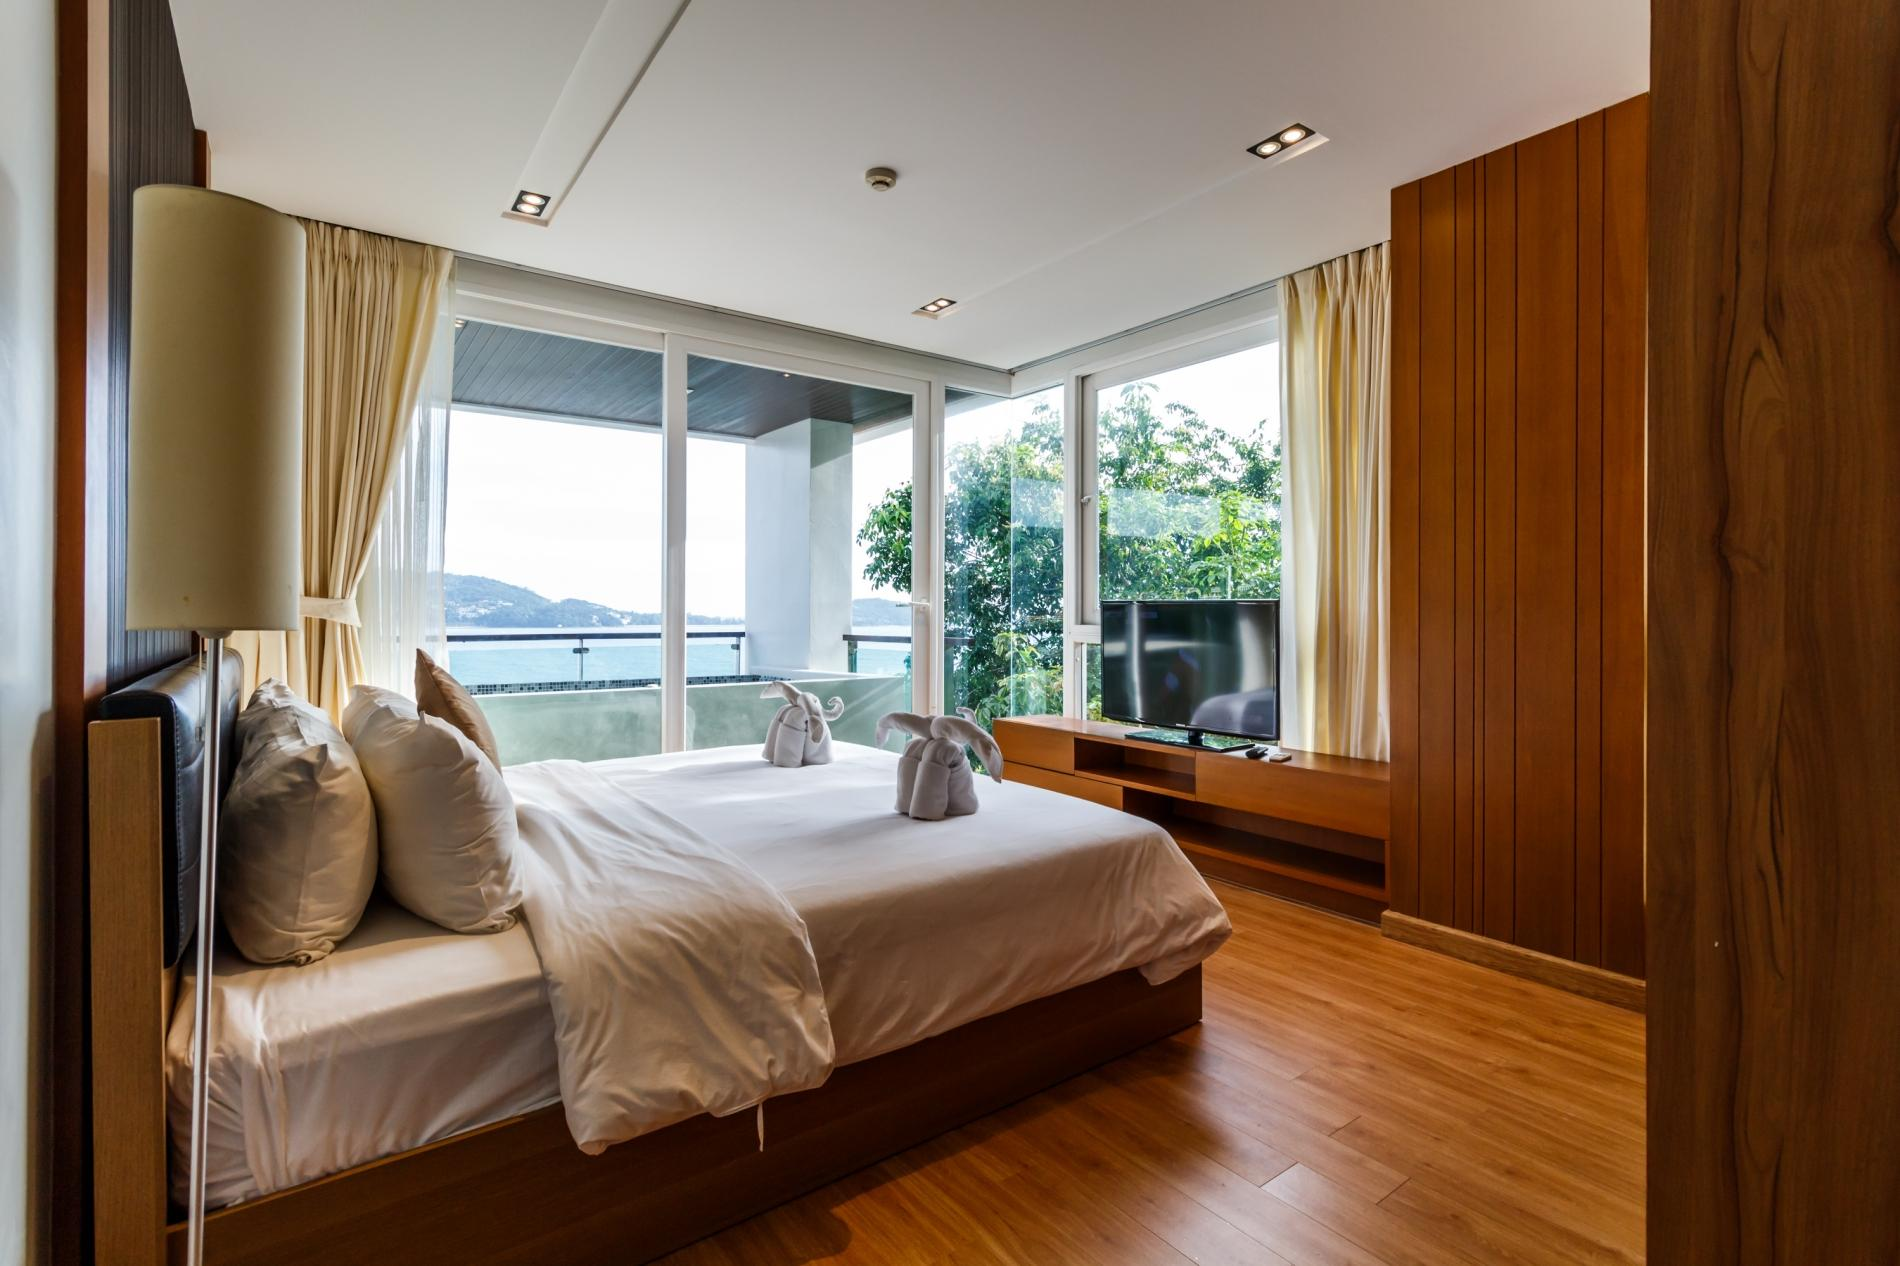 Apartment Privilege12 - Seaview 3 bedroom luxury apartment on Kalim bay photo 16833523